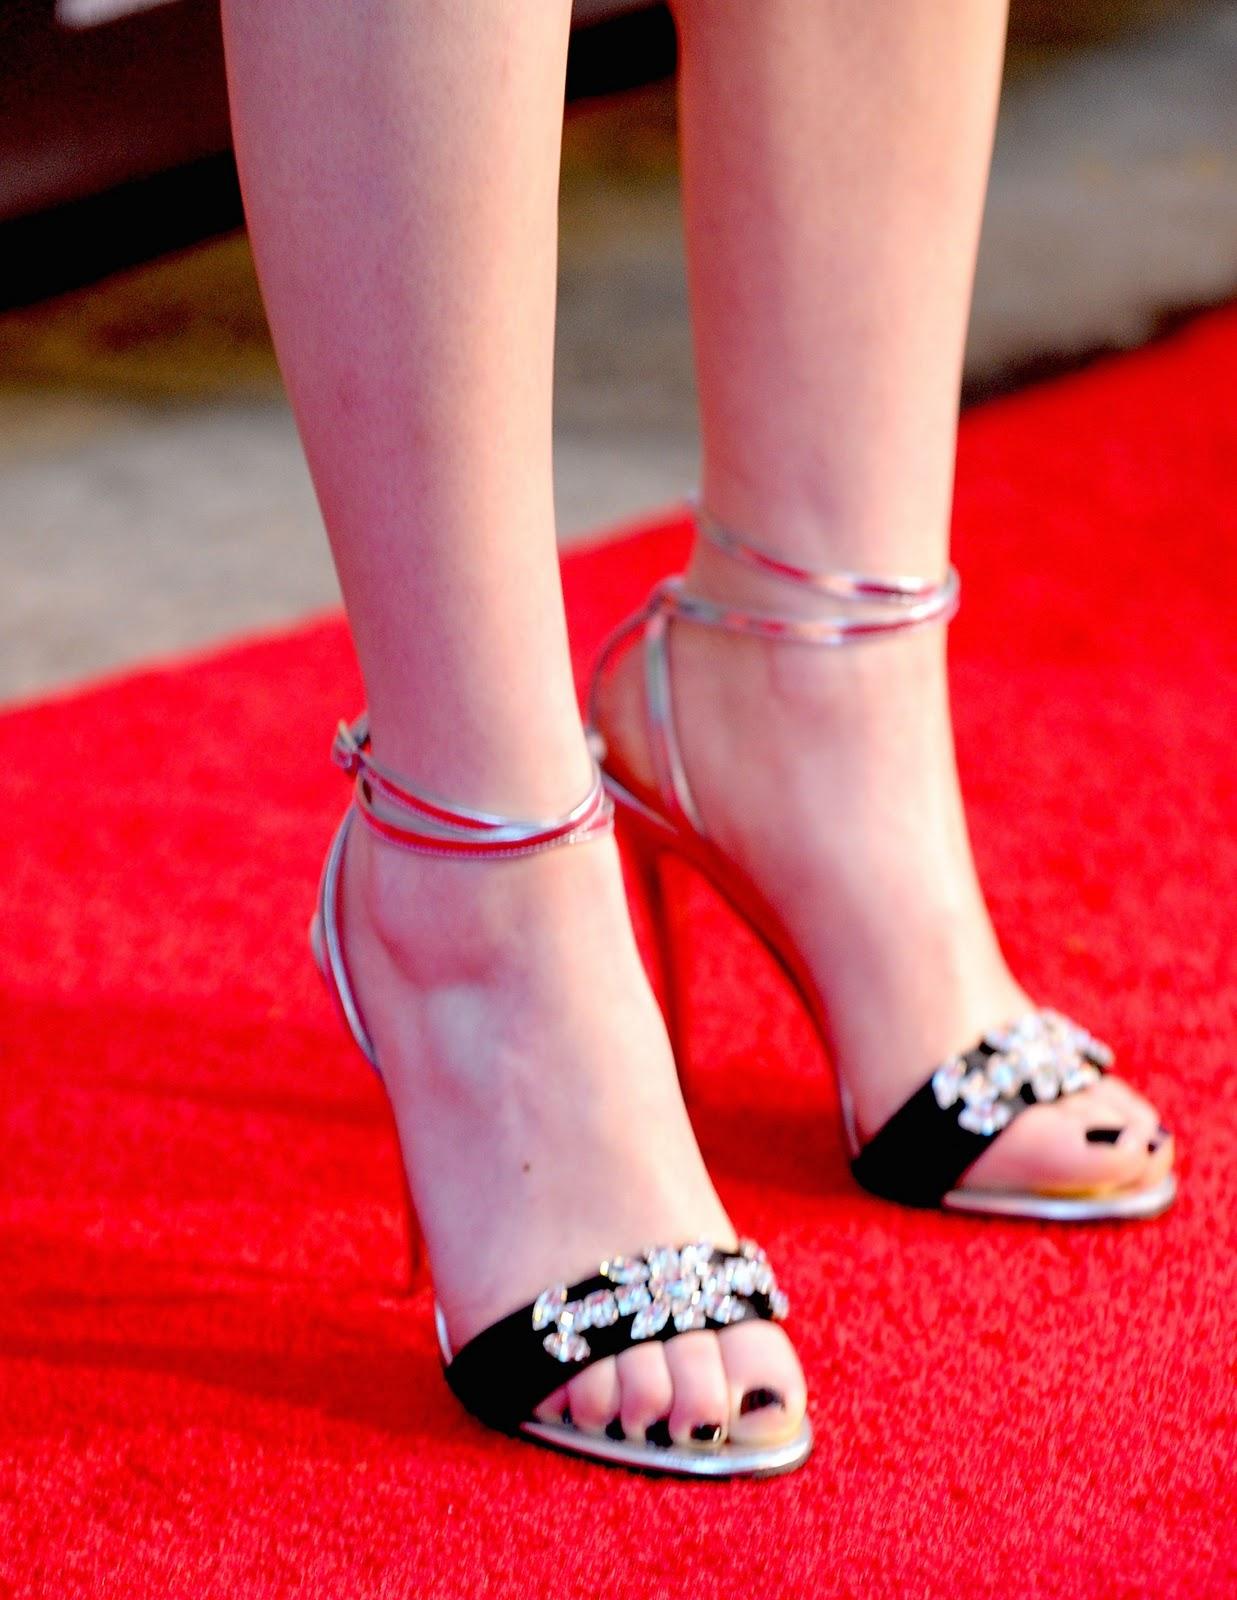 miranda cosgrove gagged feet